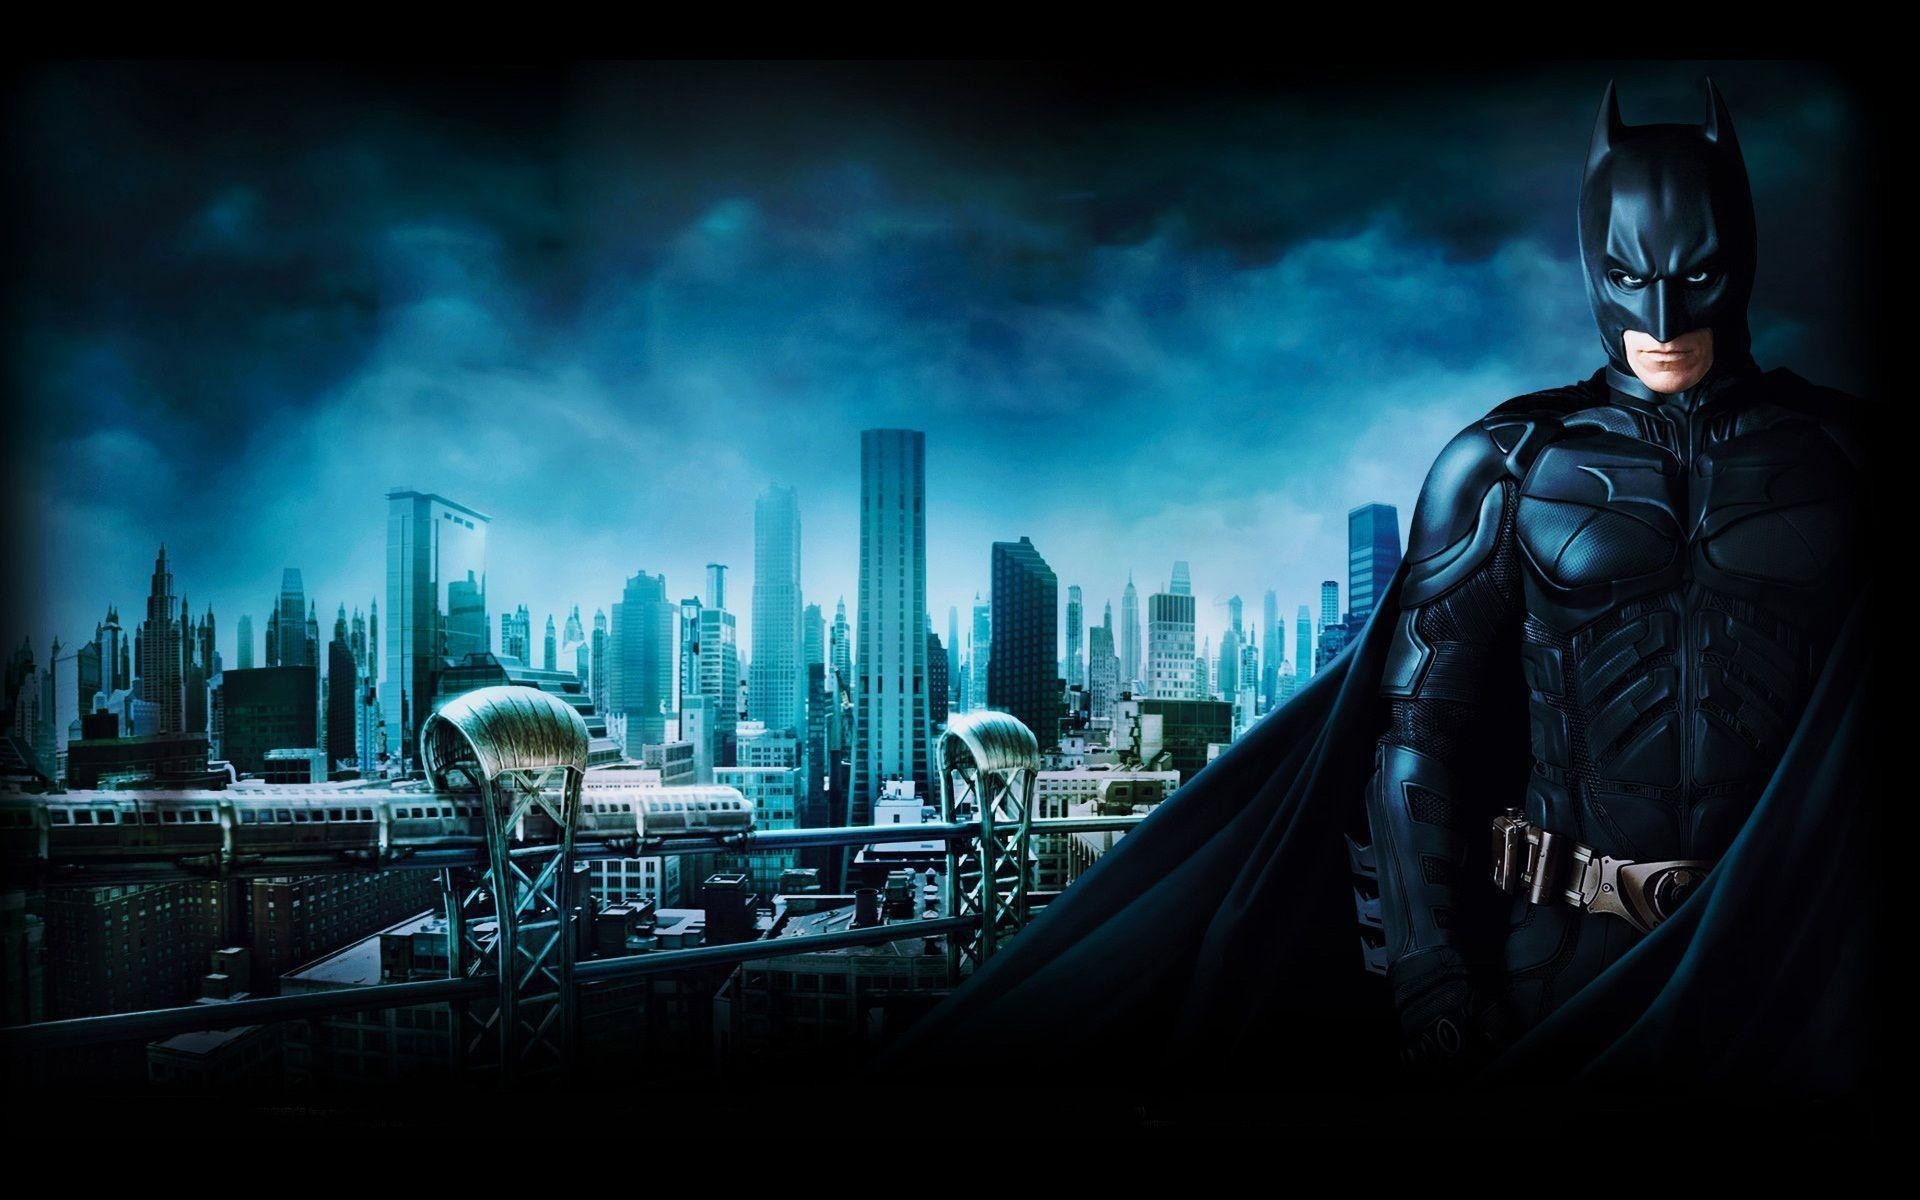 Batman 3 Gotham City Wallpapers | HD Wallpapers